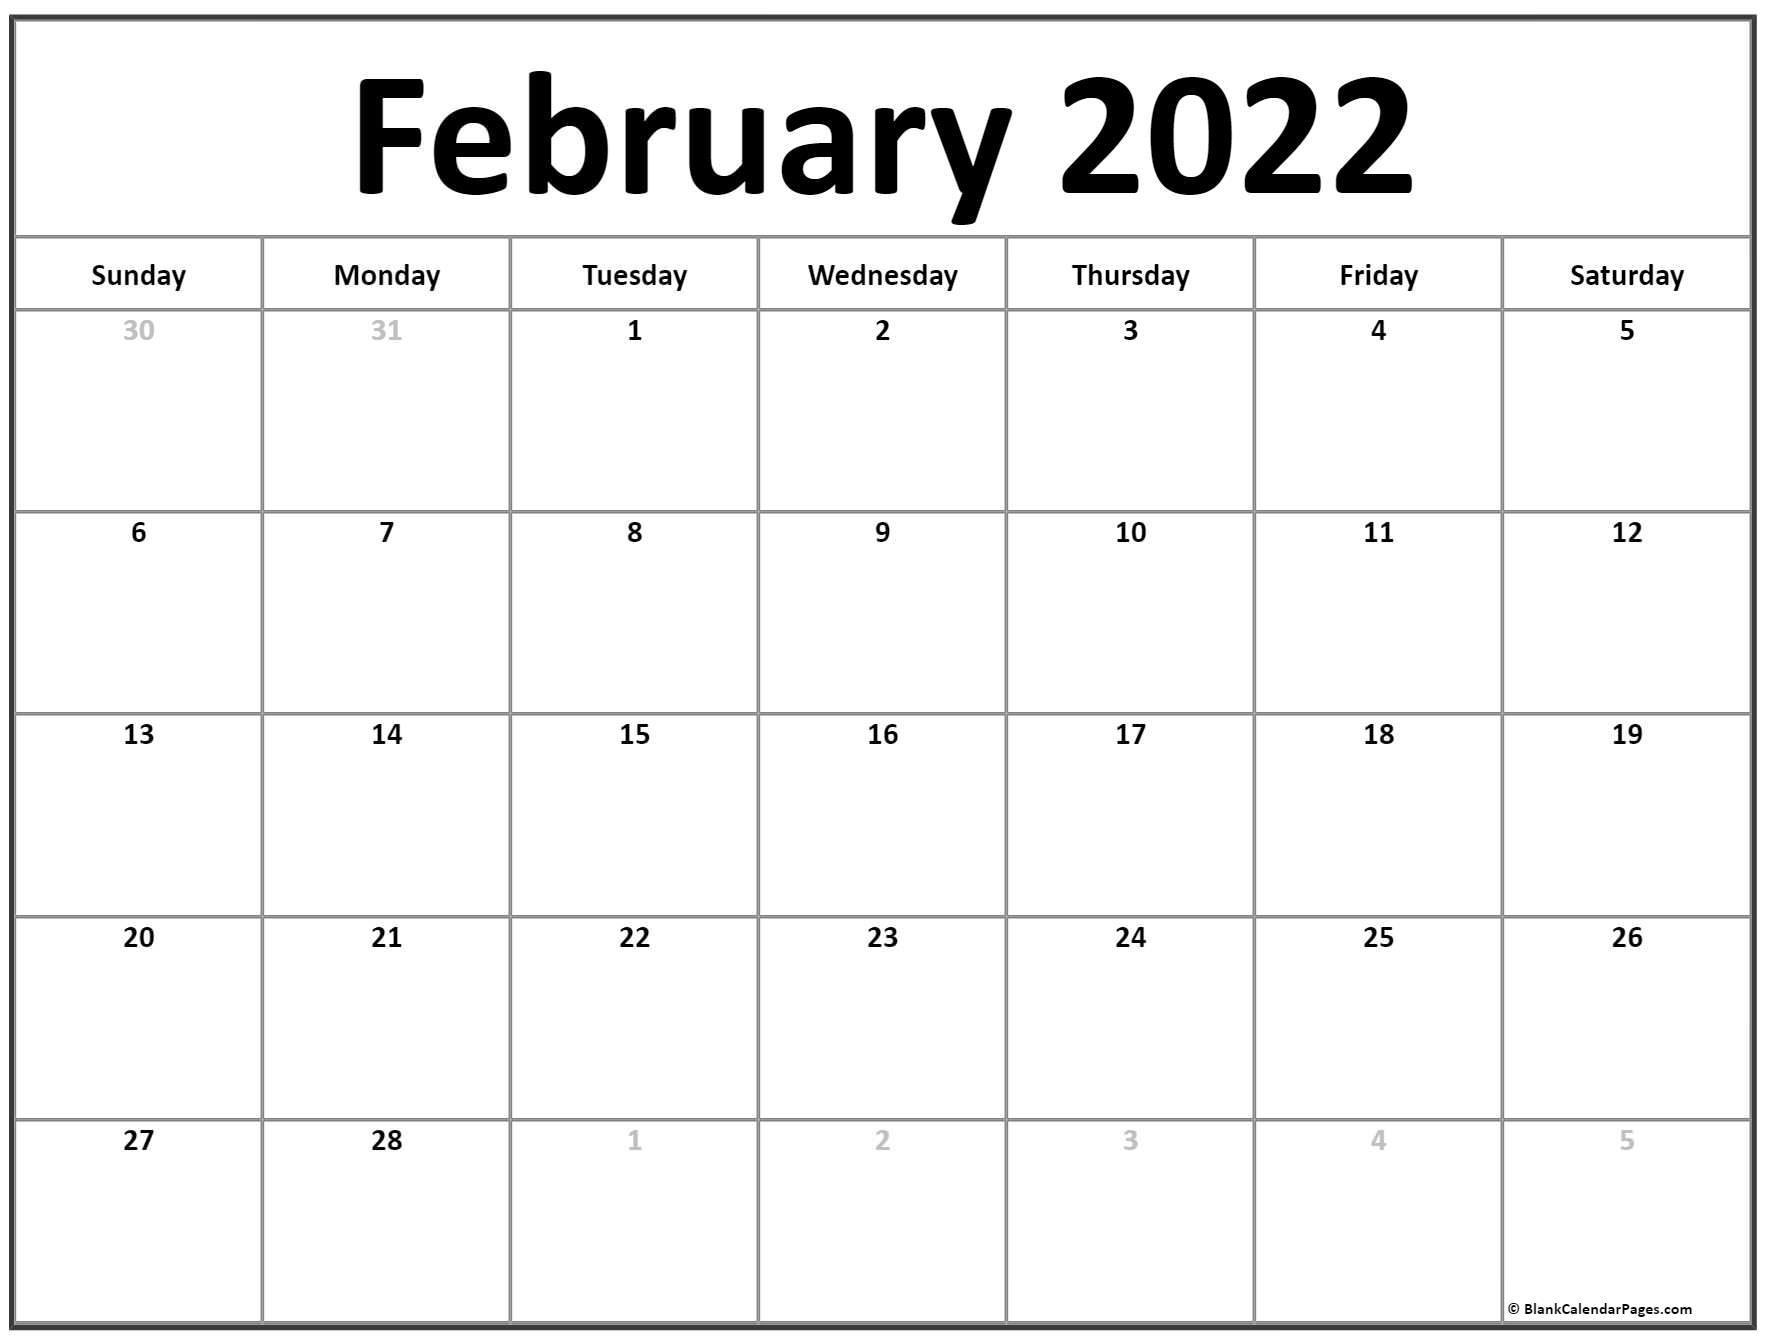 February 2022 Calendar | Free Printable Calendar Templates Intended For Fillable February 2022 Calendar